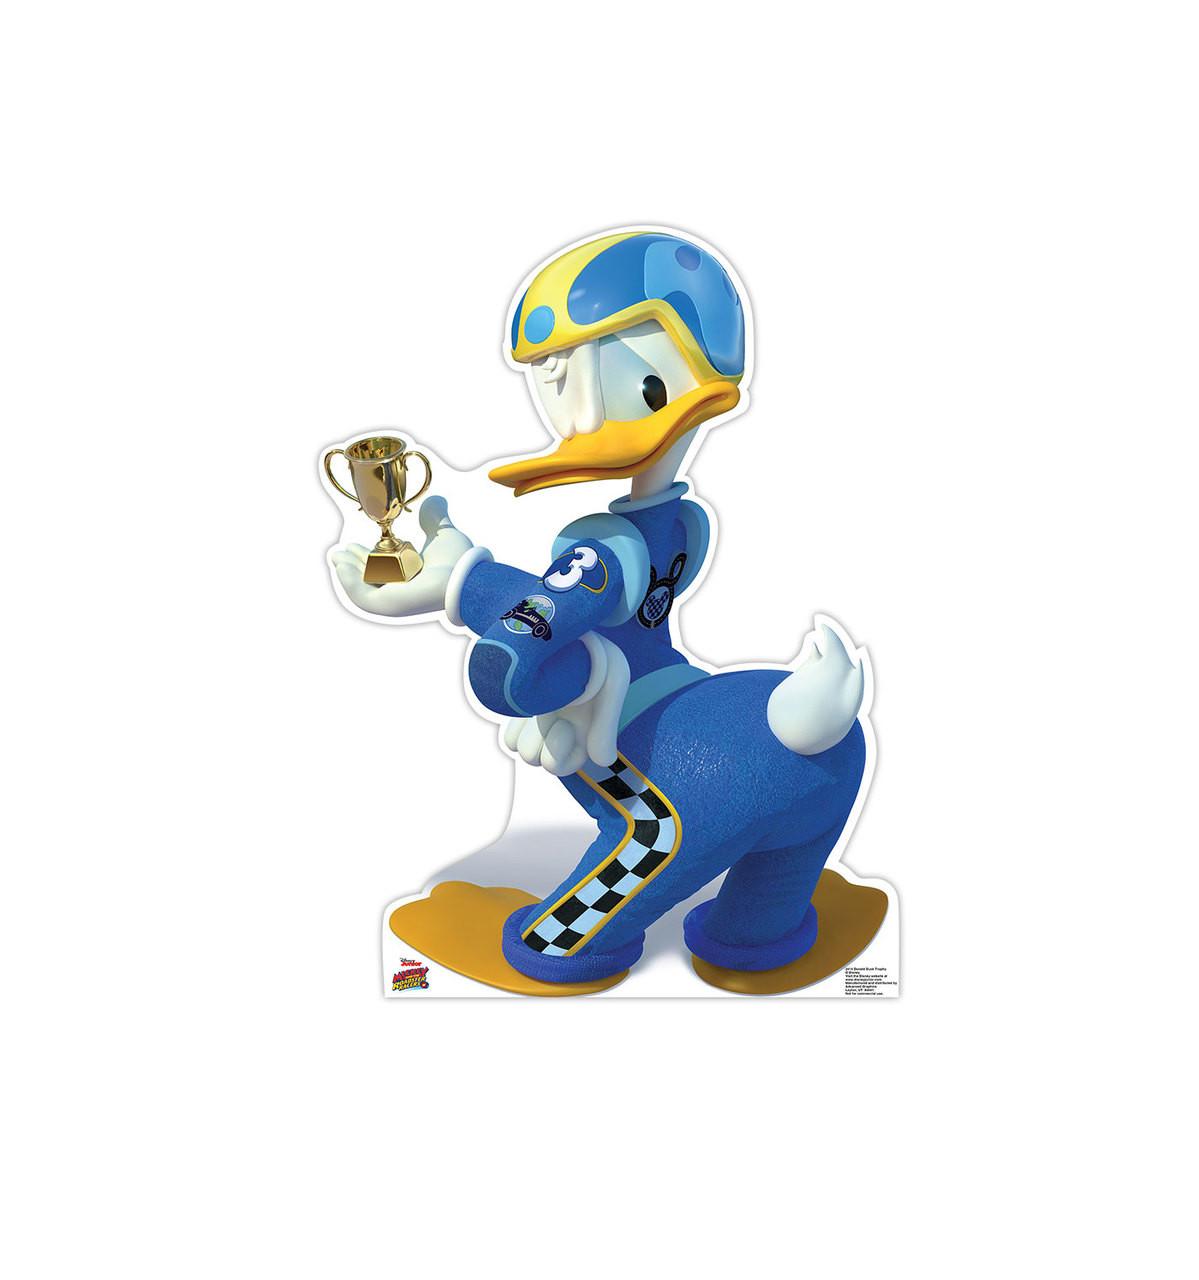 Donald Duck Trophy - Disney's Roadster Racers - Cardboard Cutout